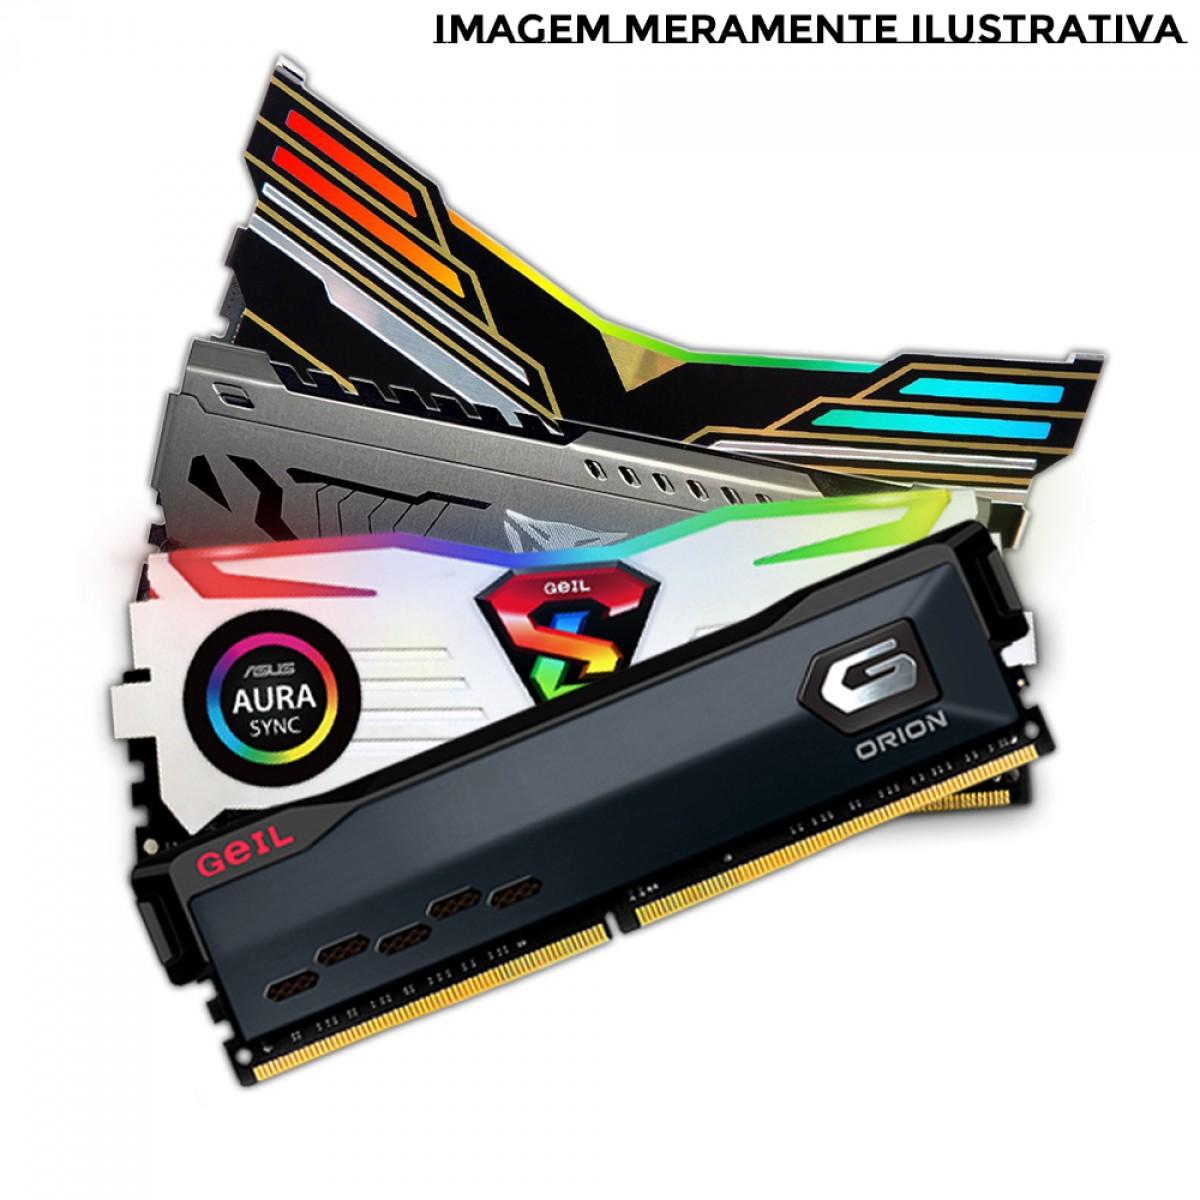 Kit Upgrade, ASUS TUF Gaming X570-Plus + AMD Ryzen 7 5700G + Memória DDR4, 16GB 3000MHz